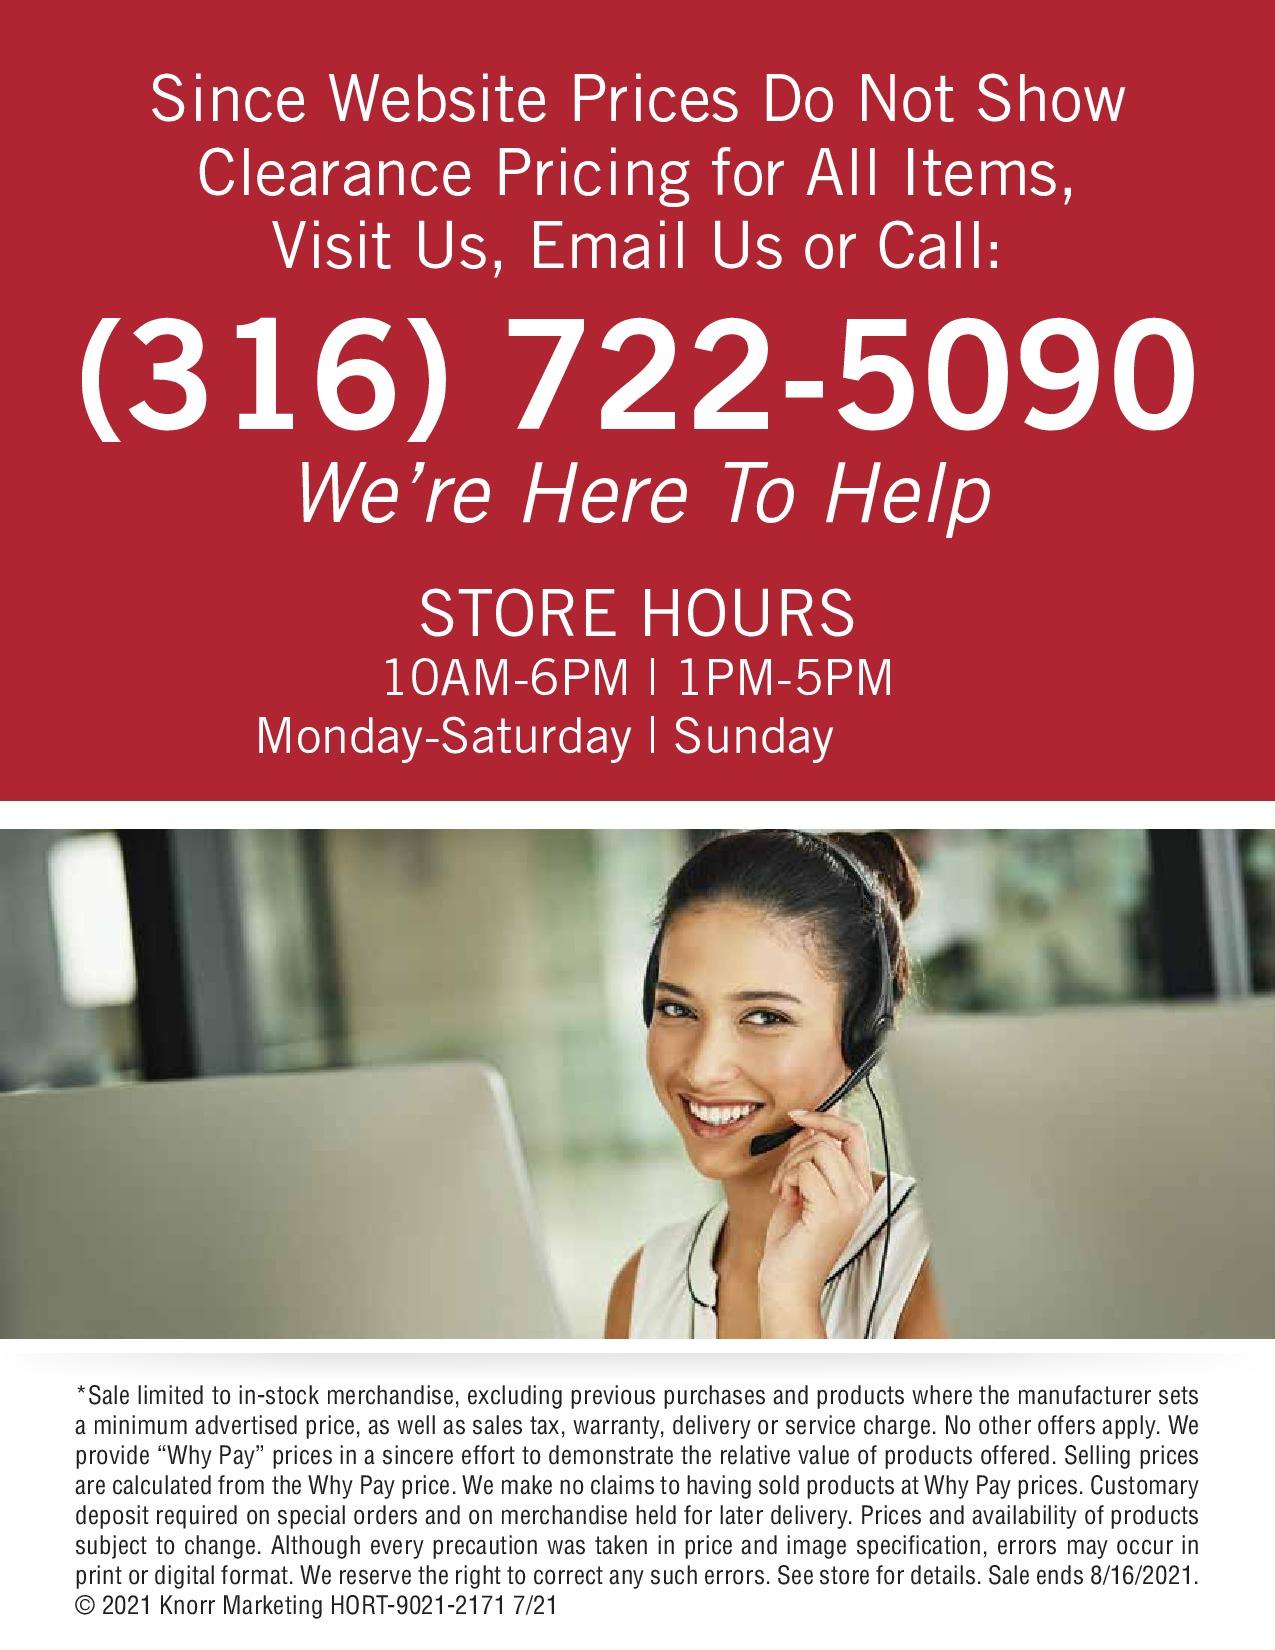 HORT-9021-2171-InventoryClearance-WebSpecial (1)